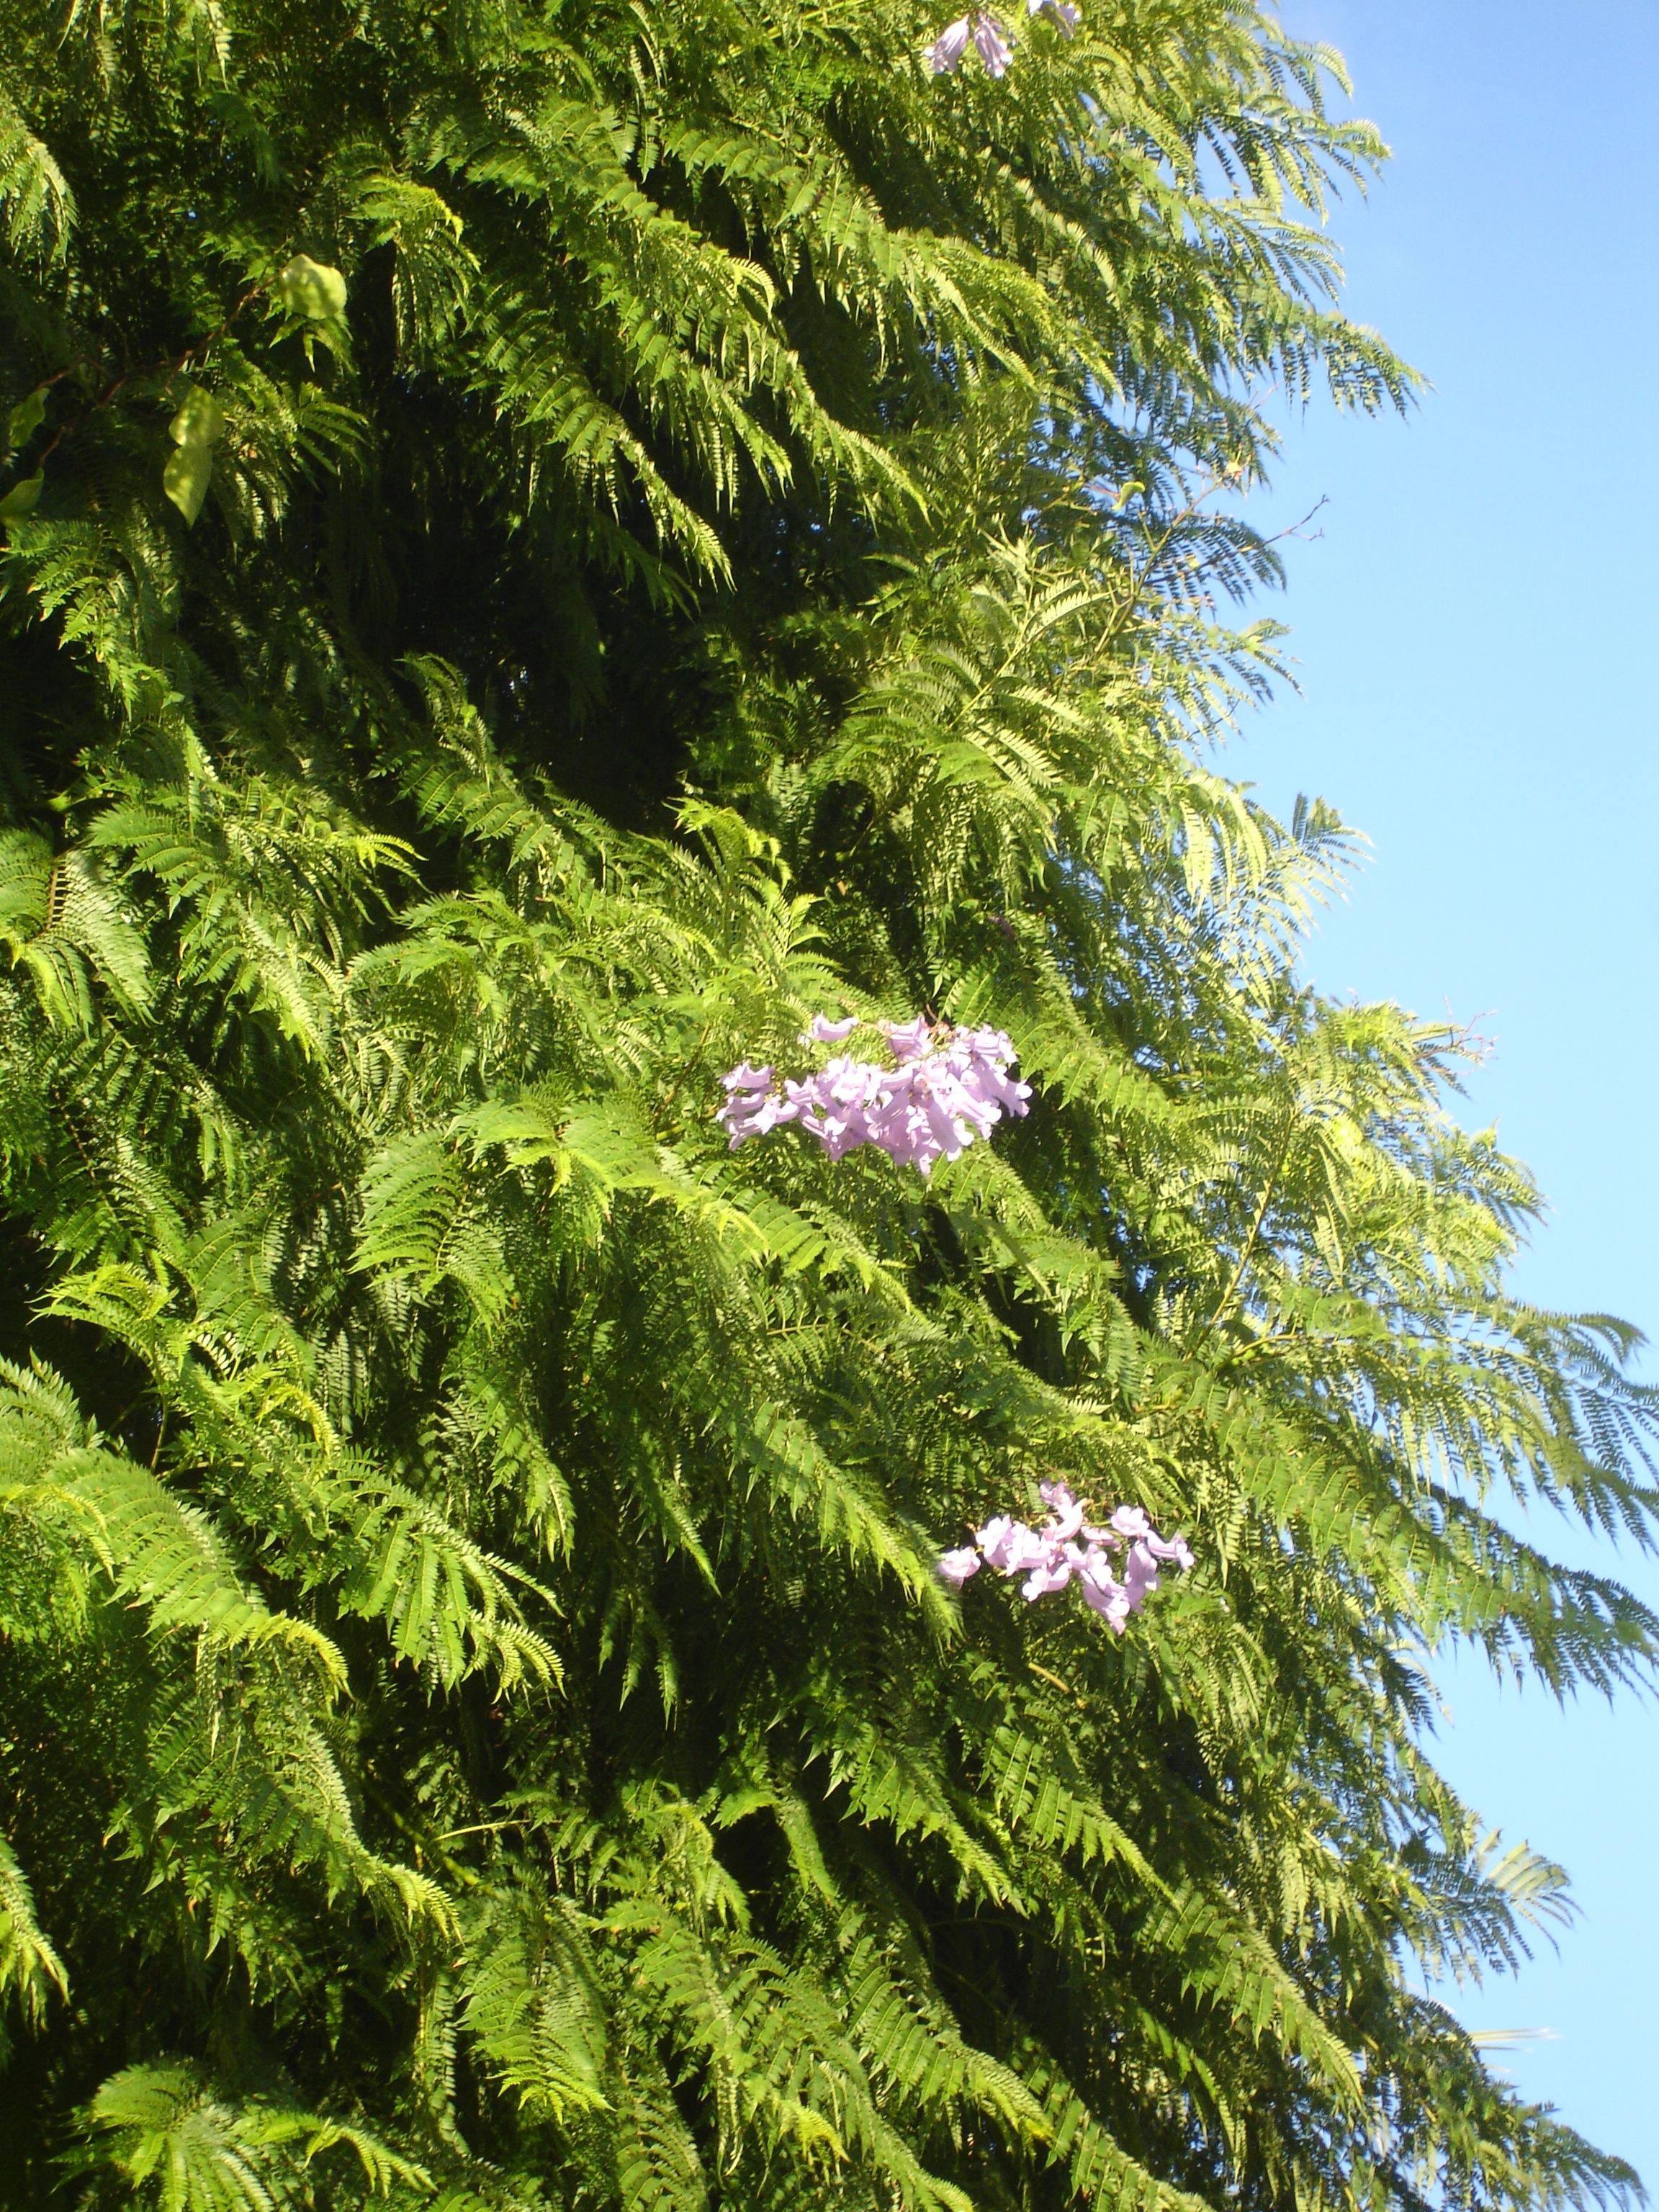 les jacarandas sont en fleur - Page 2 274444Jacarandamimosifoliadetailfleurs